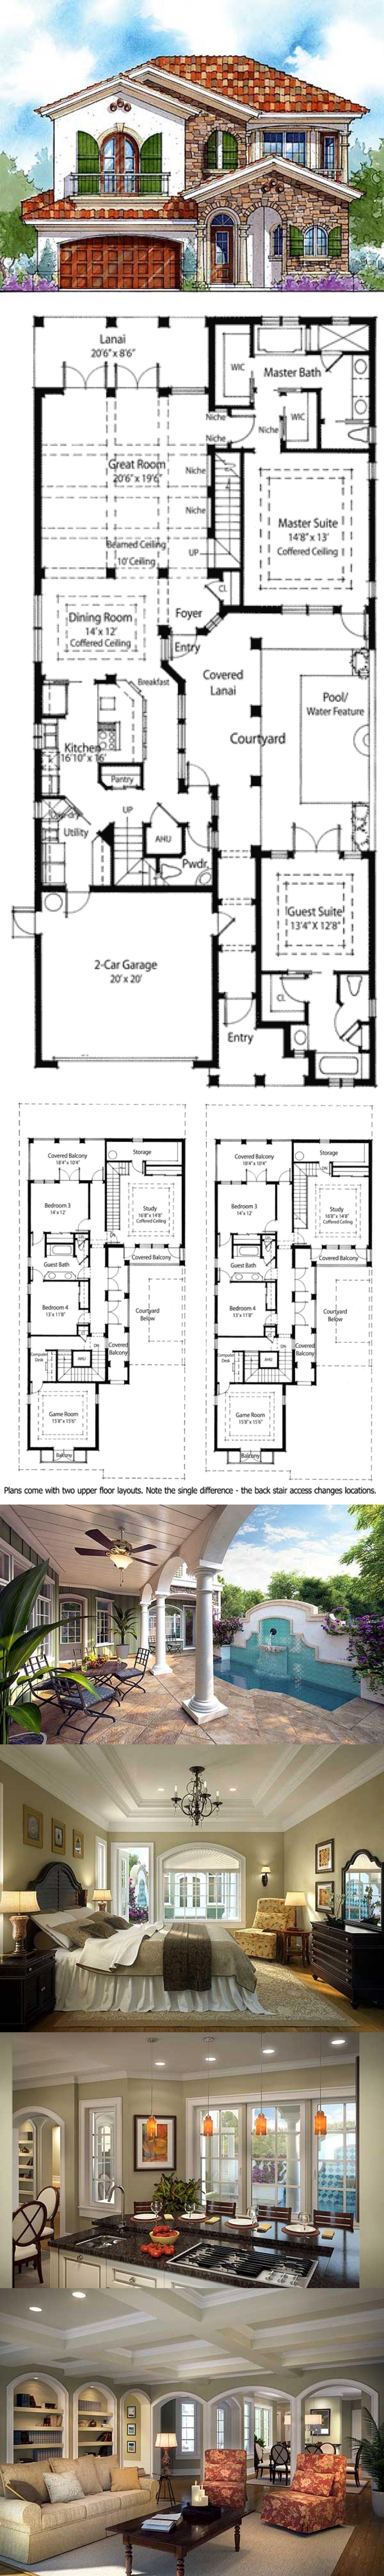 Plan 33047zr Energy Saving Courtyard House Plan House Plans Courtyard House Architecture Plan